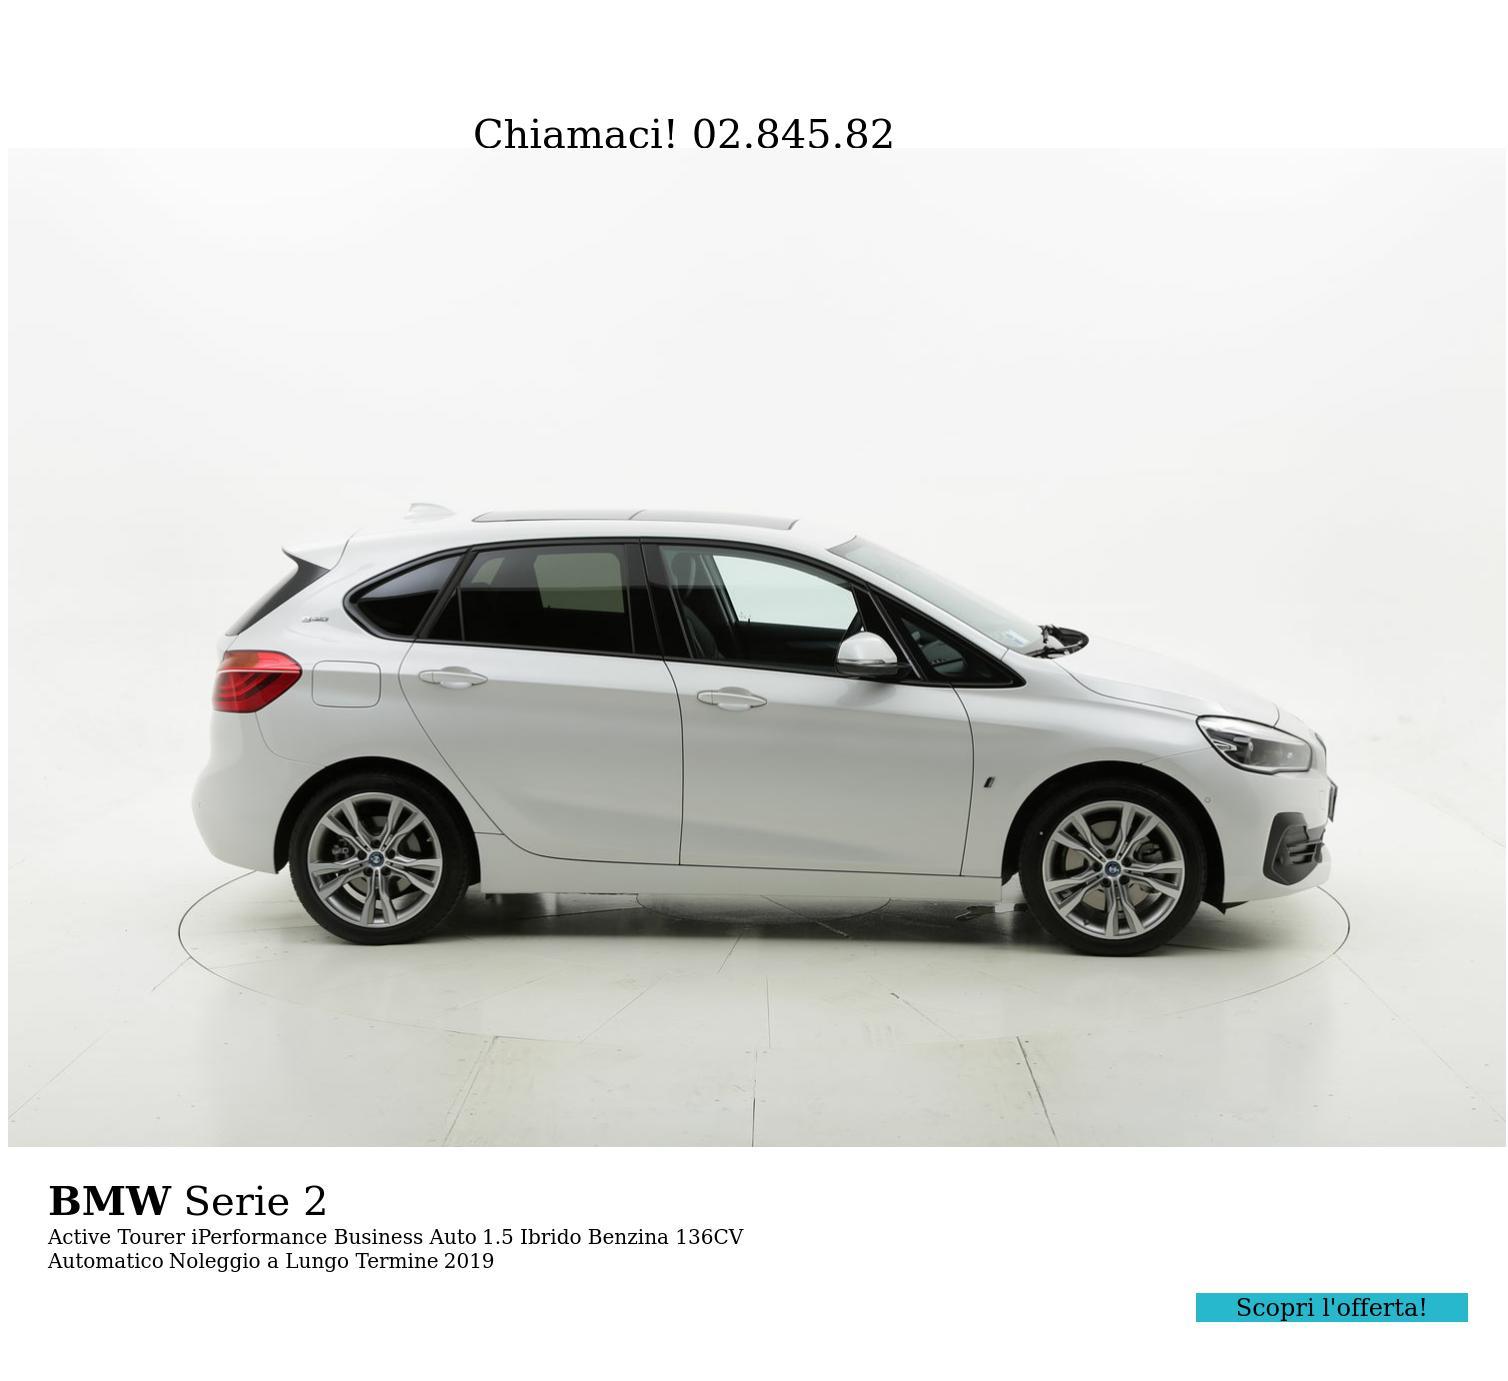 BMW Serie 2 ibrido benzina bianca a noleggio a lungo termine | brumbrum